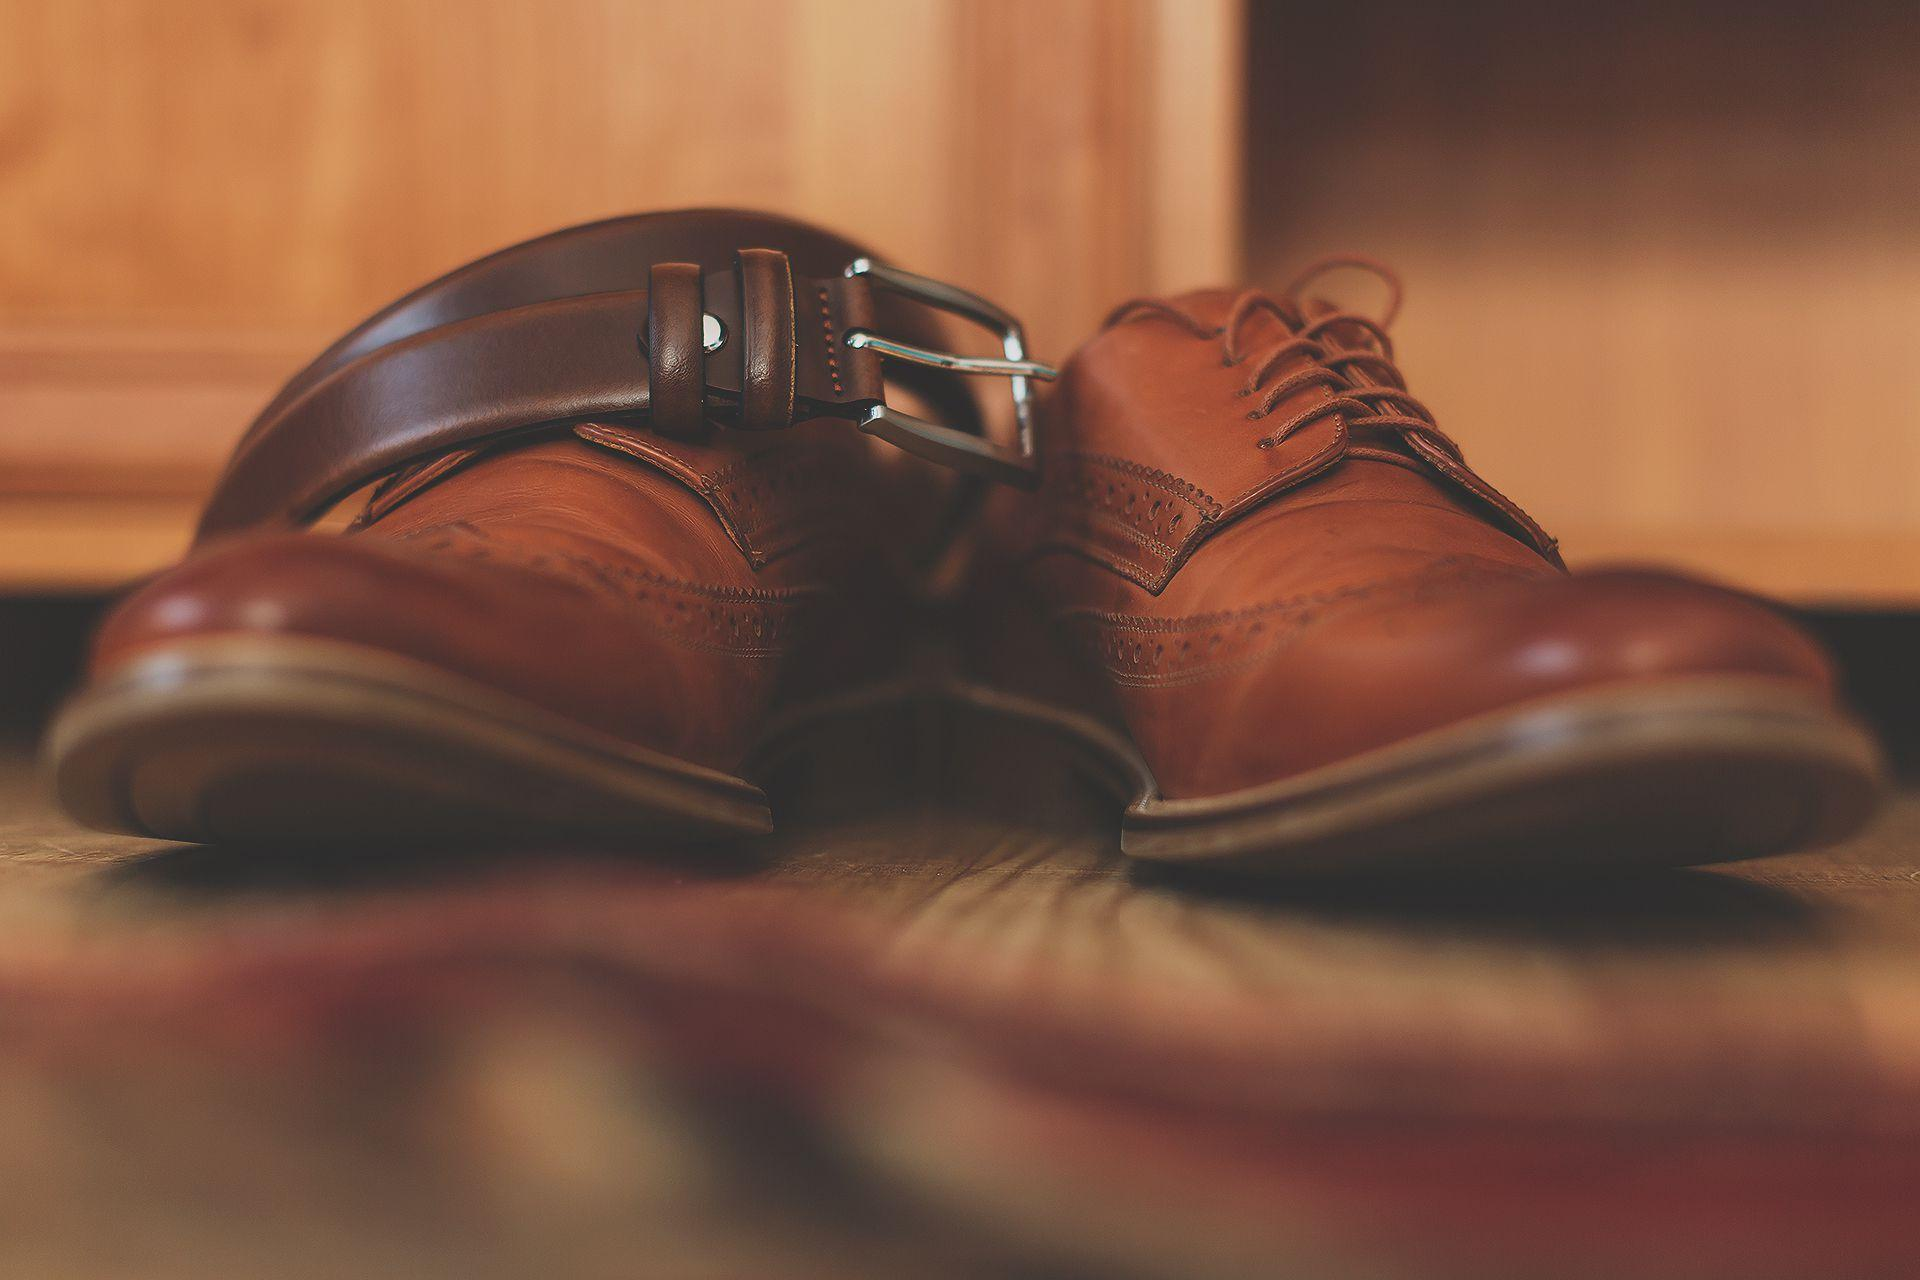 Buty ślubne - pan młody